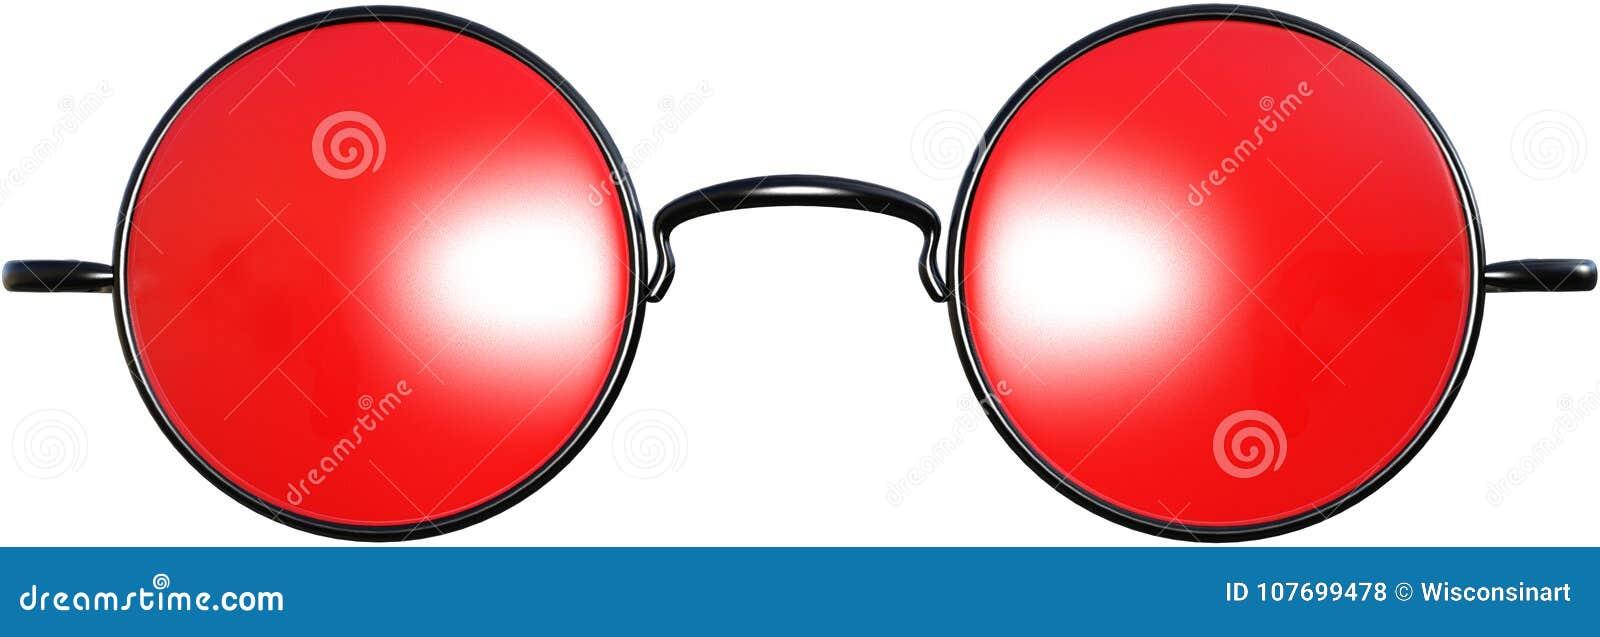 057b674397 Ζευγάρι των ροδαλών χρωματισμένων γυαλιών ηλίου Τα κόκκινα θεάματα είναι  απομονωμένα στο λευκό Αρχείο PNG διαθέσιμο Η ένδυση ματιών έχει ένα πλαίσιο  ...